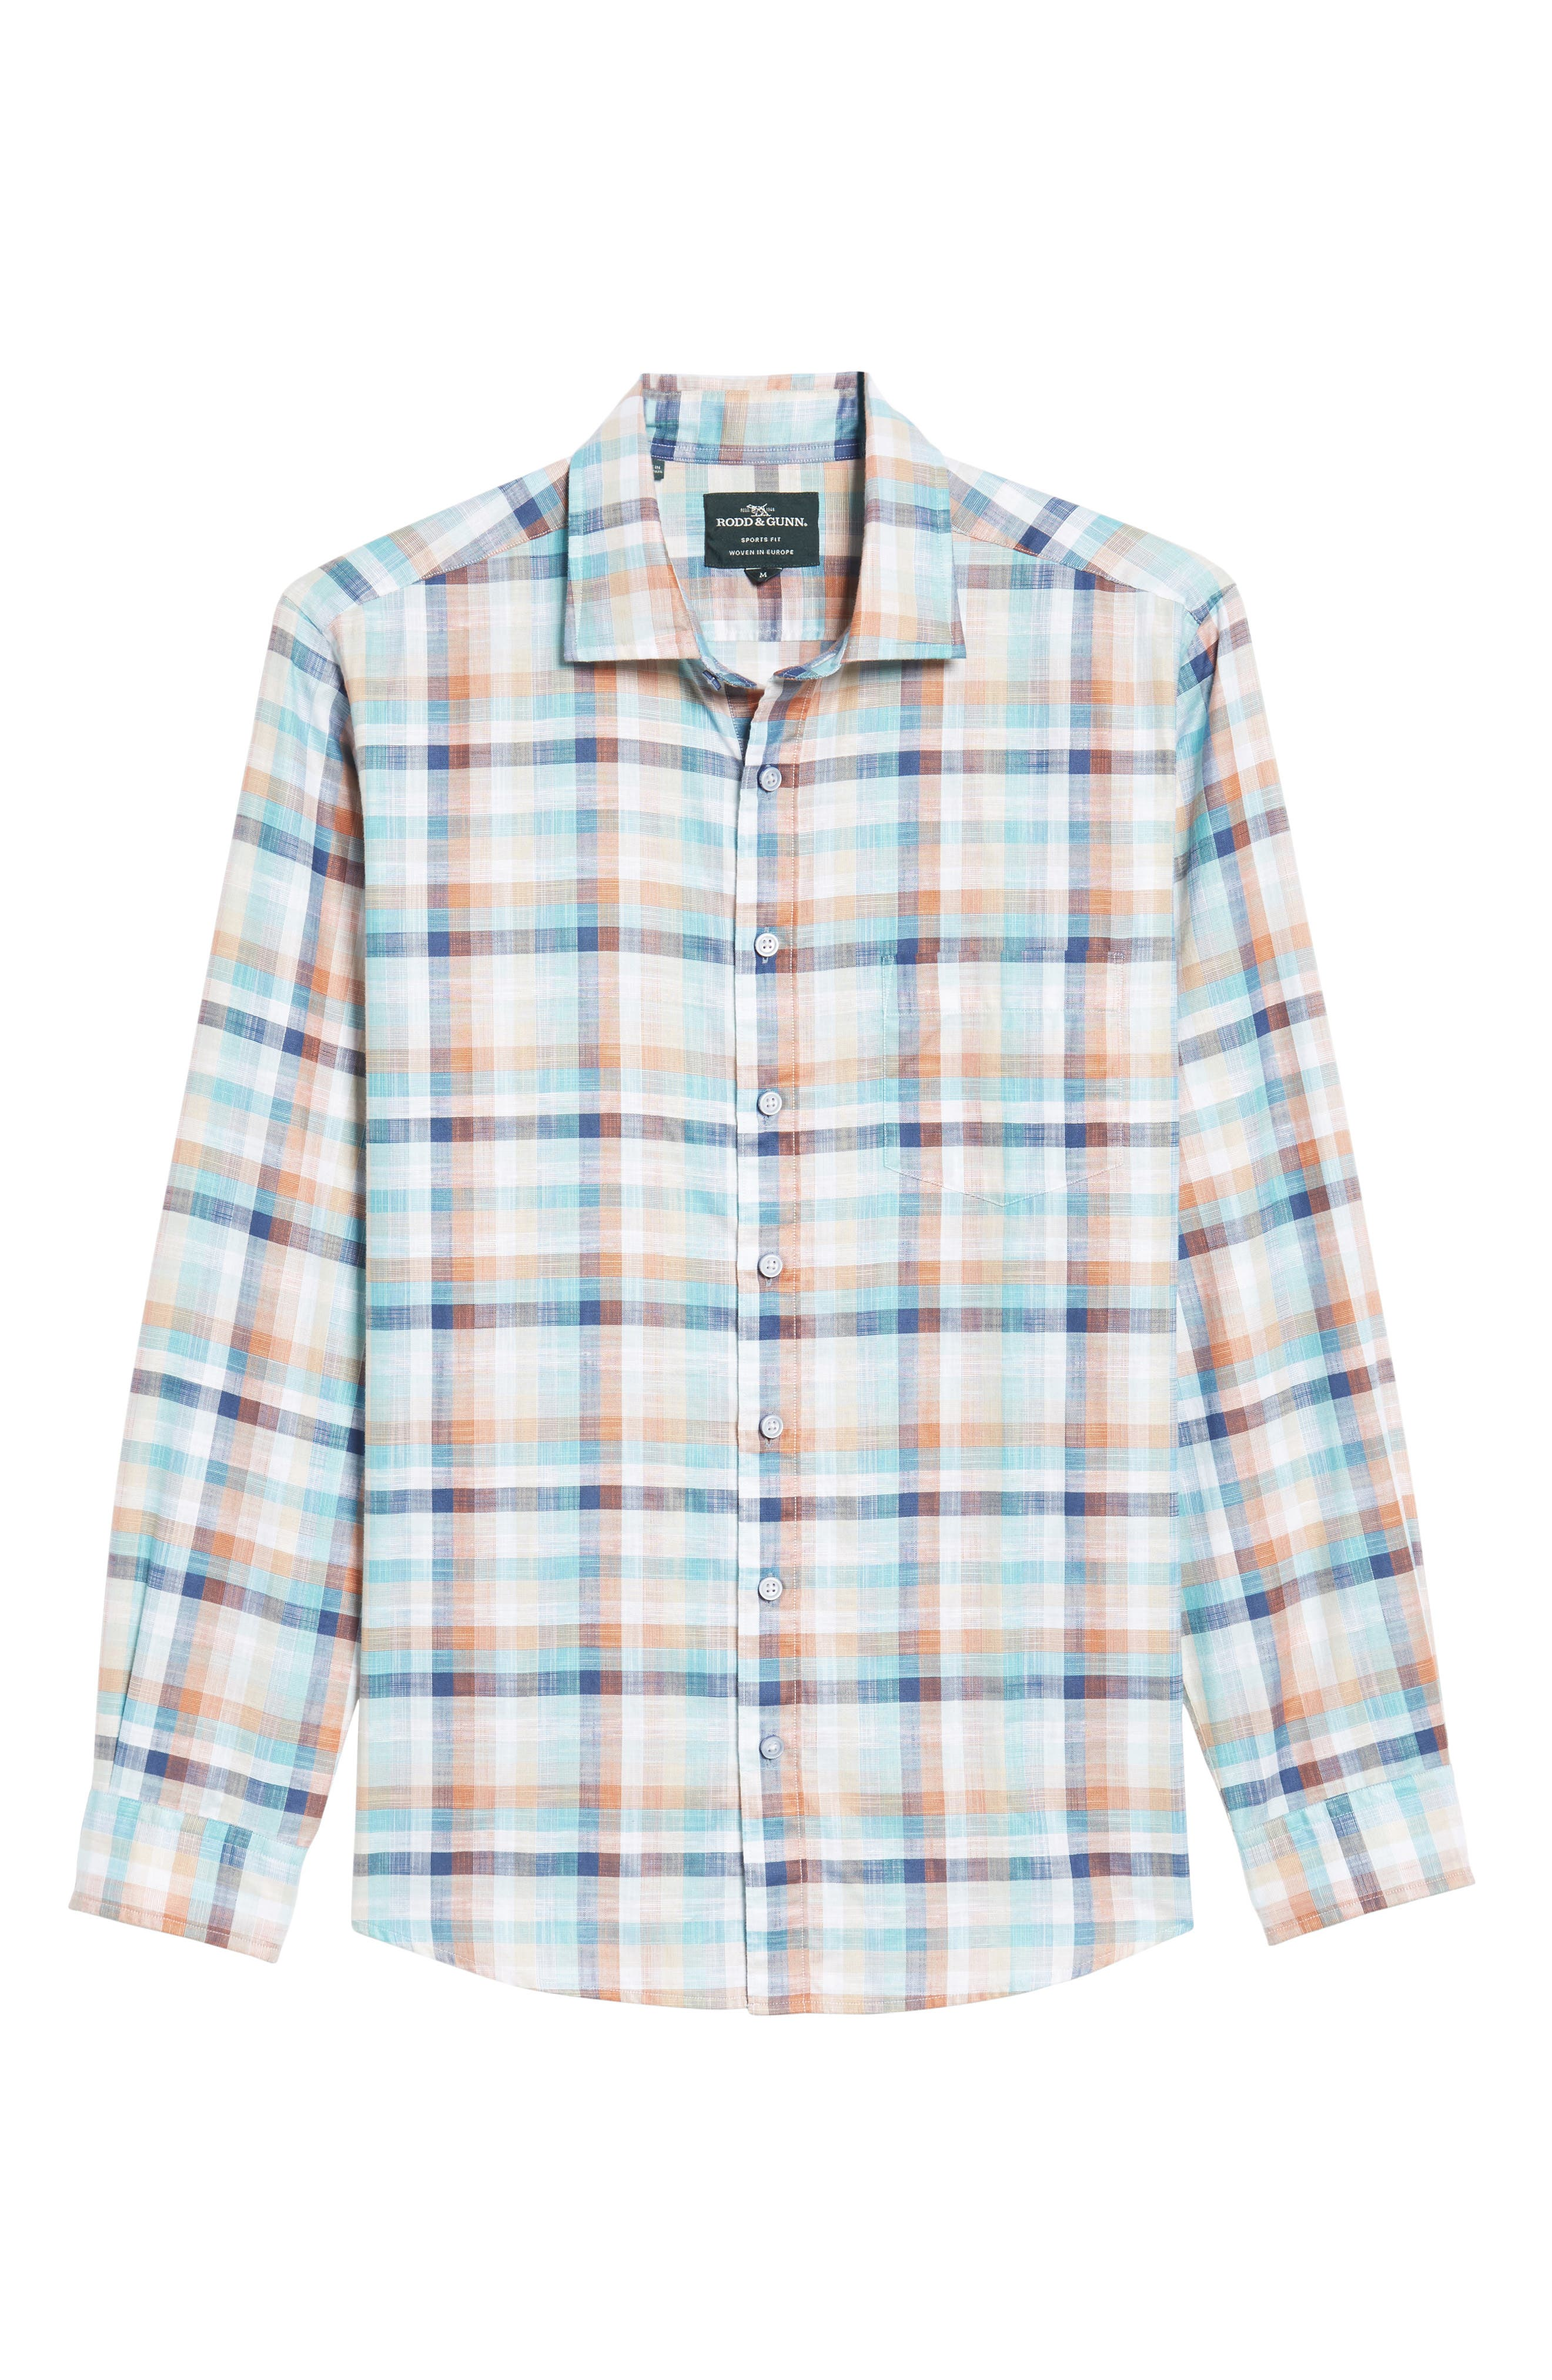 Blackburn Plaid Sport Shirt,                             Alternate thumbnail 6, color,                             Ochre